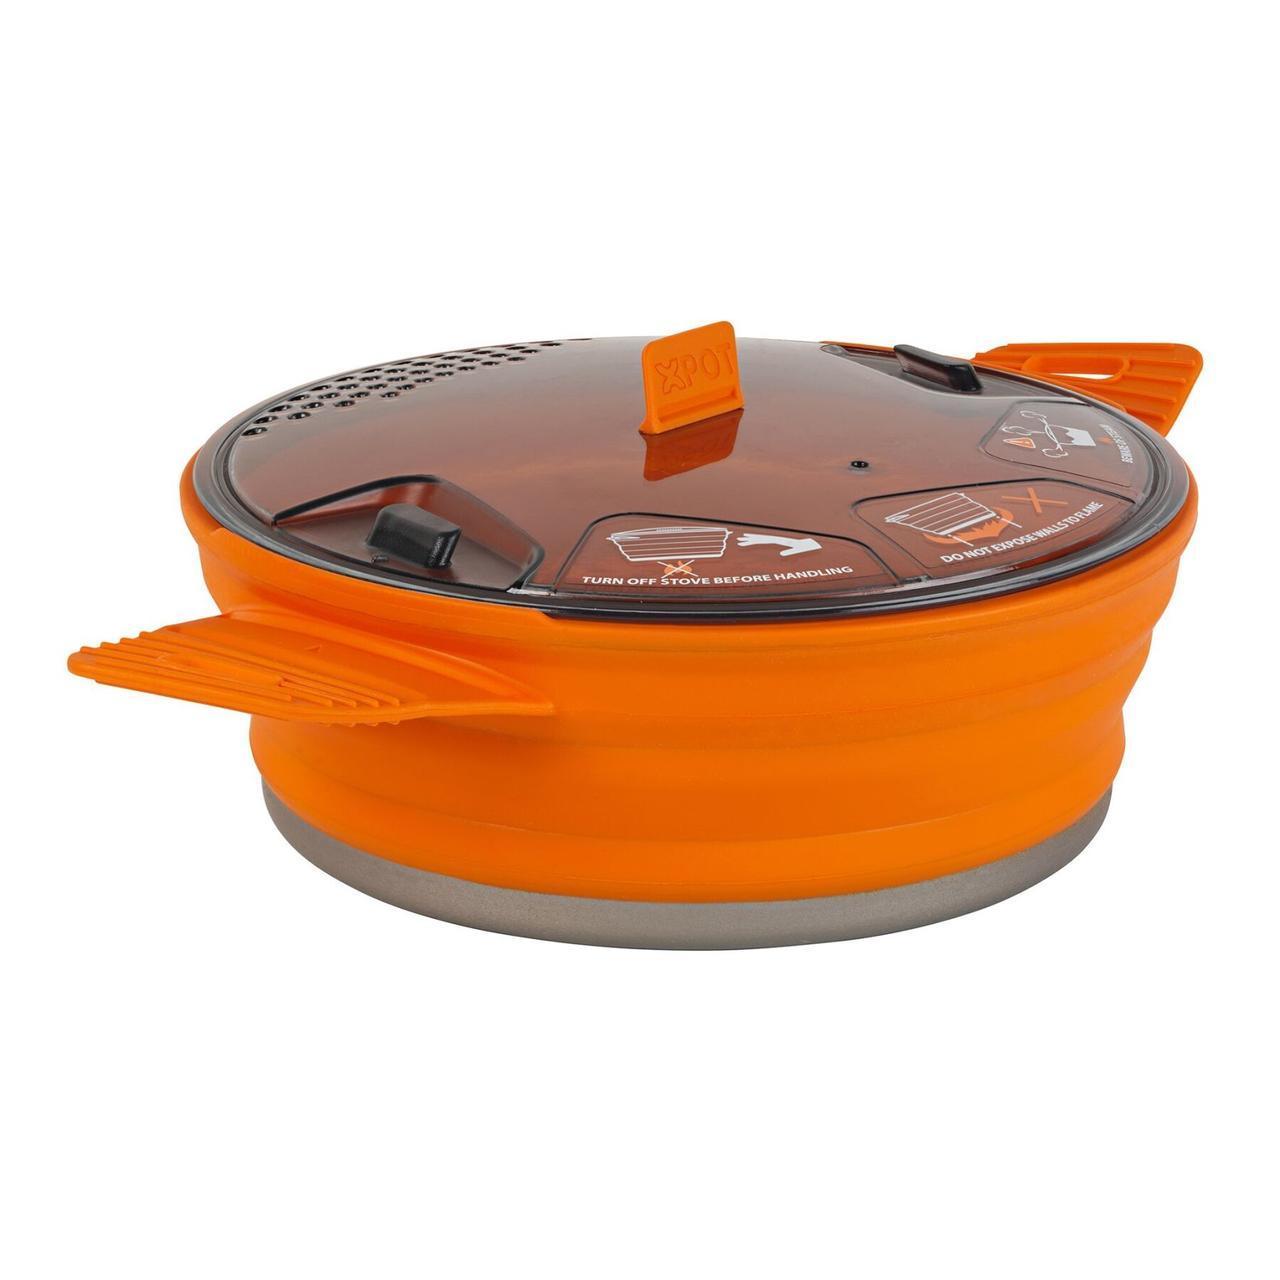 Каструля складана Sea To Summit X-Pot 1,4 Orange